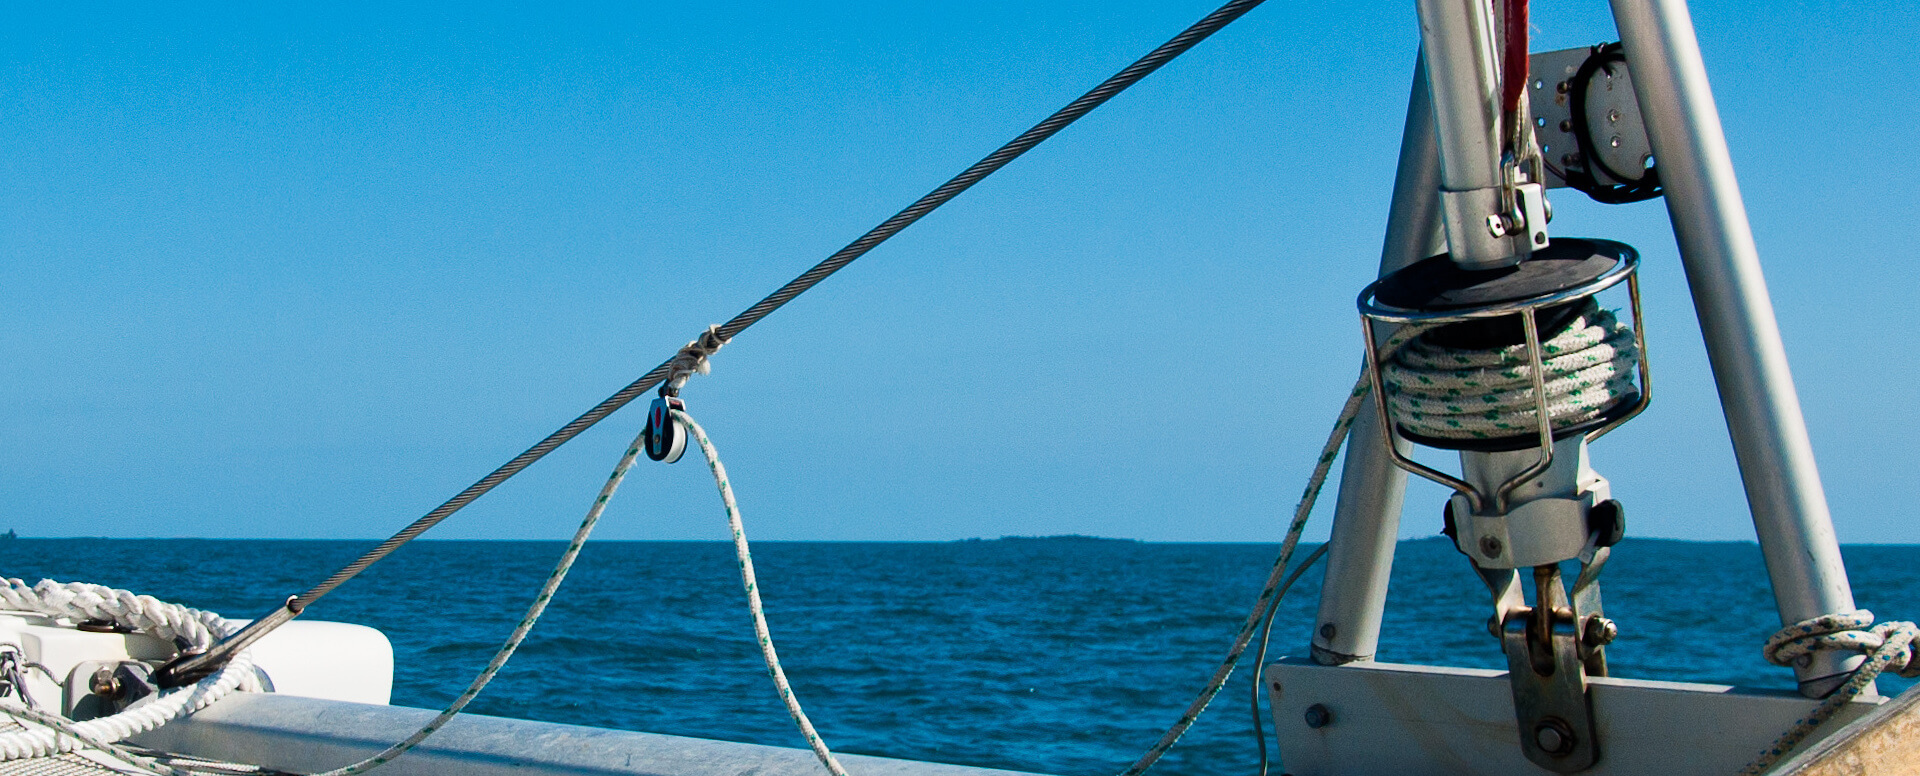 8. Cruise on a Catamaran - Mauritius